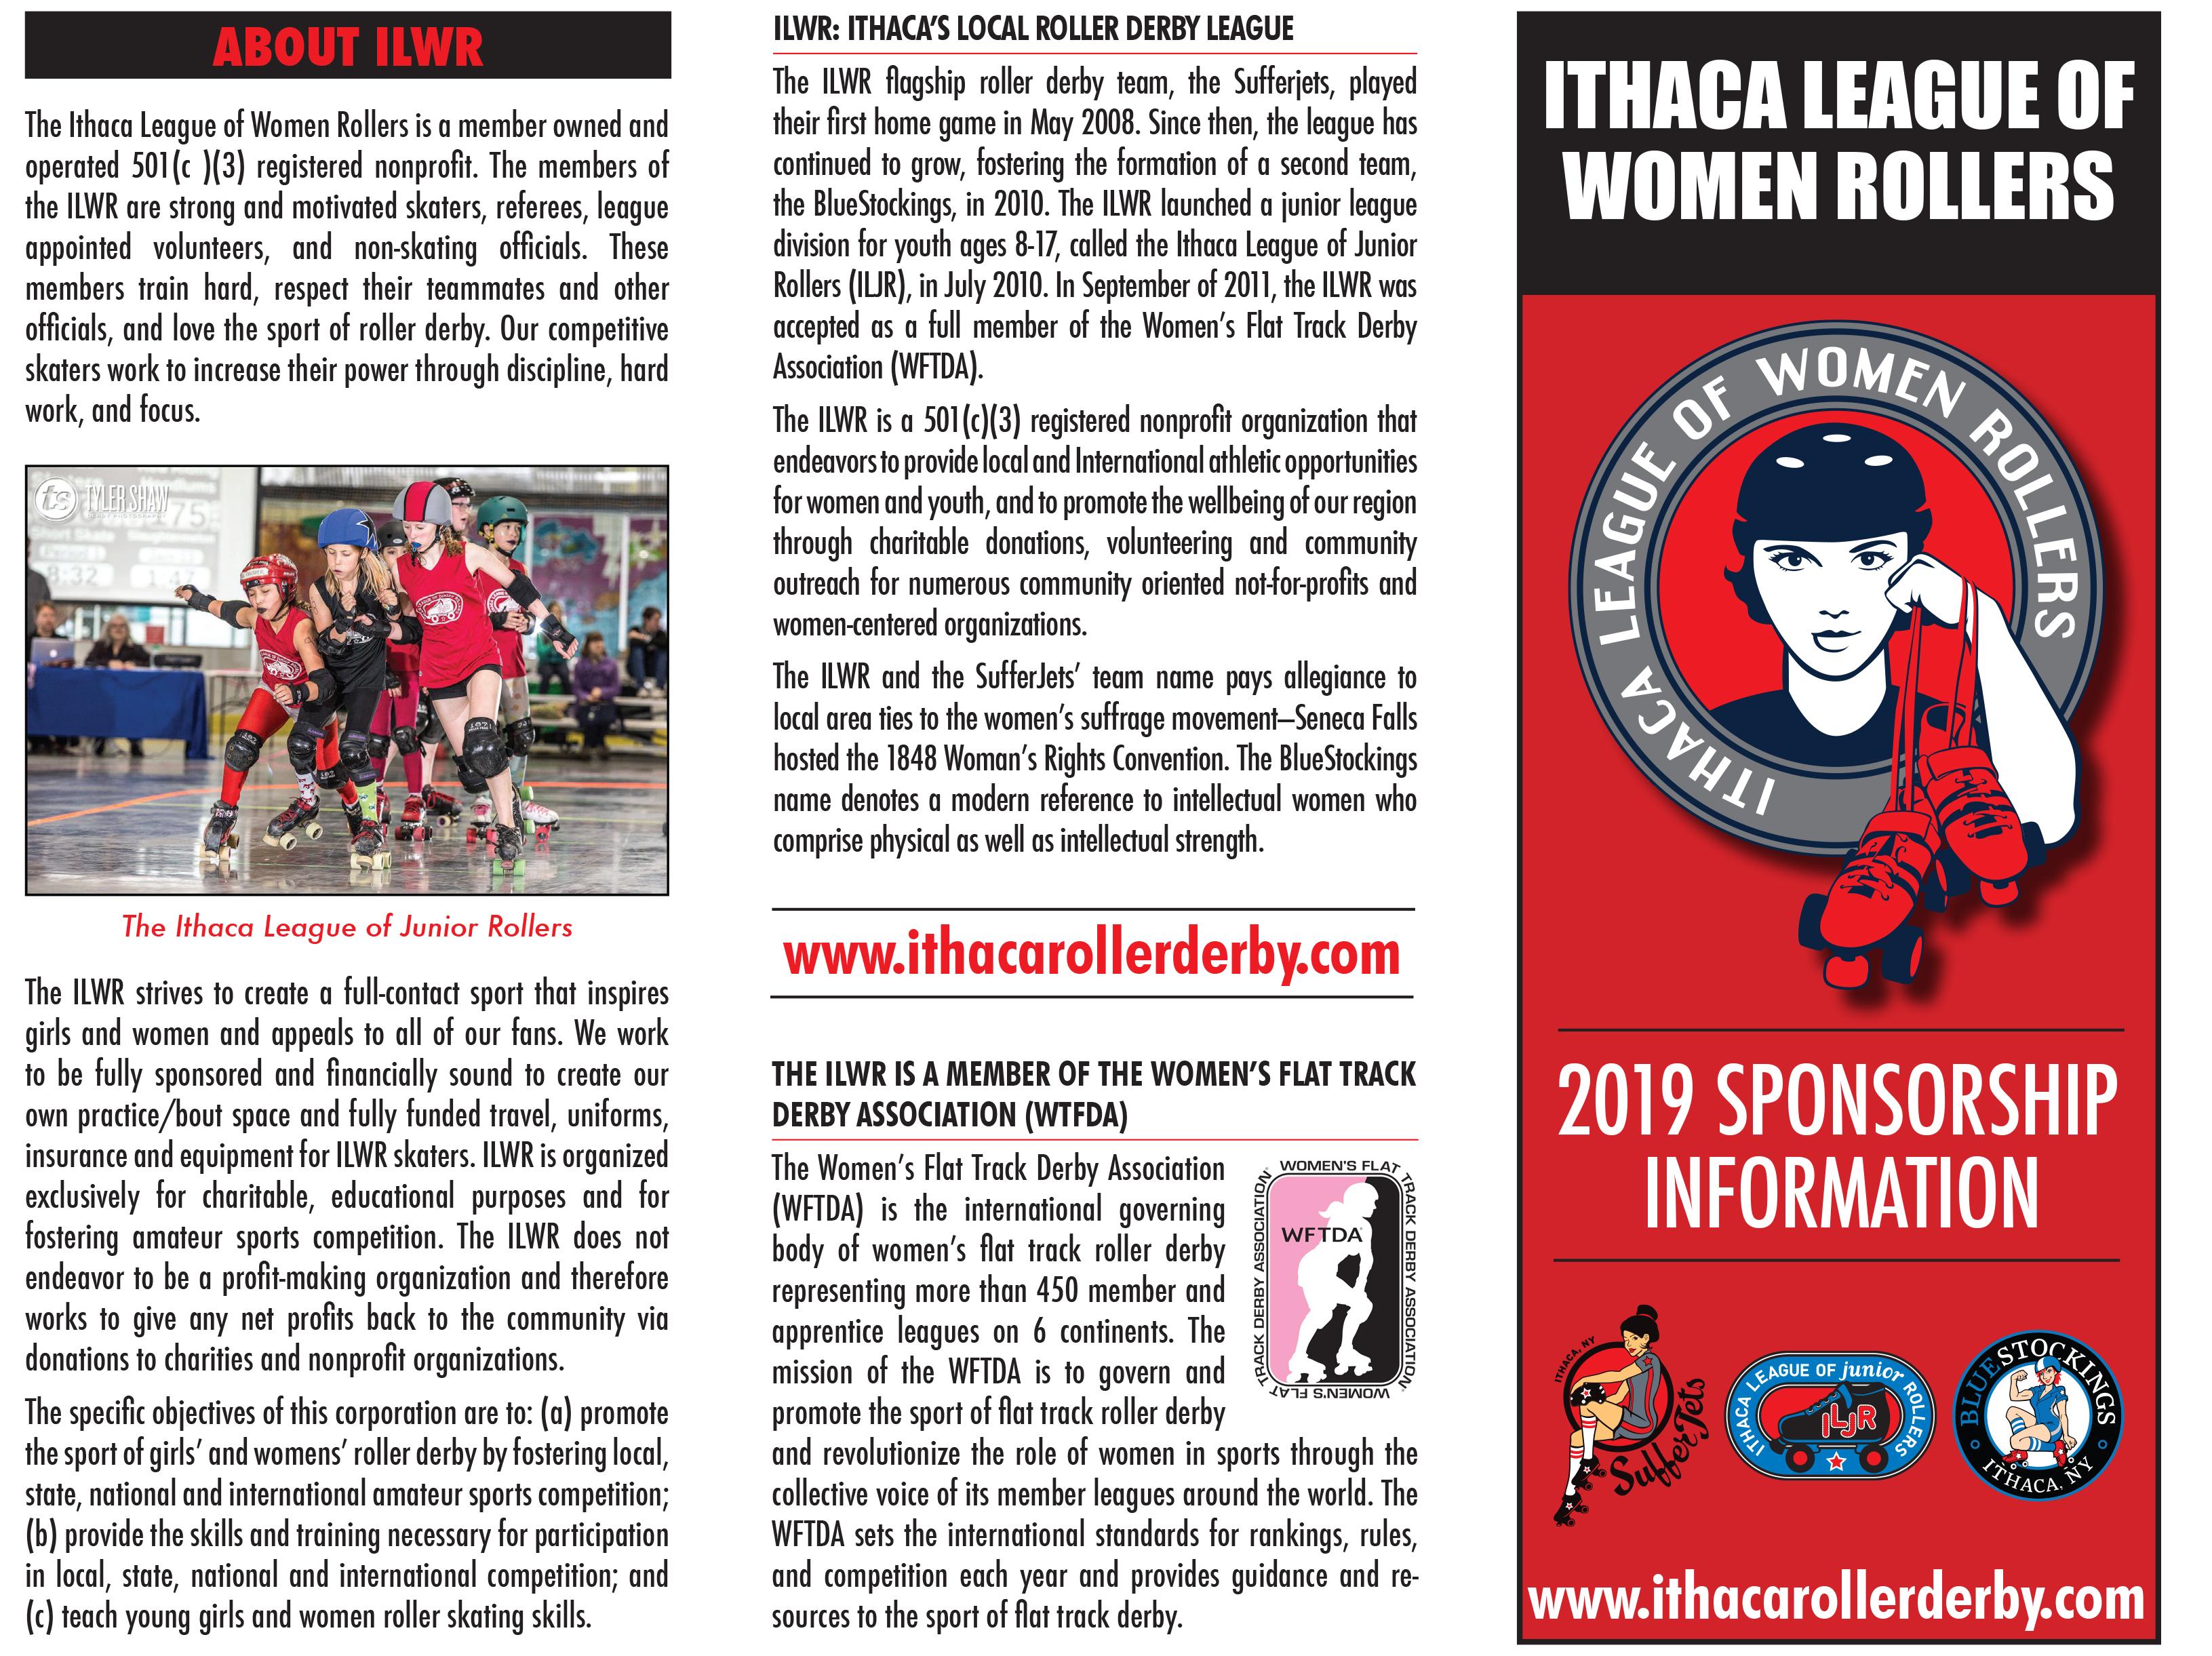 2019-ILWR-Sponsorship-1.jpg